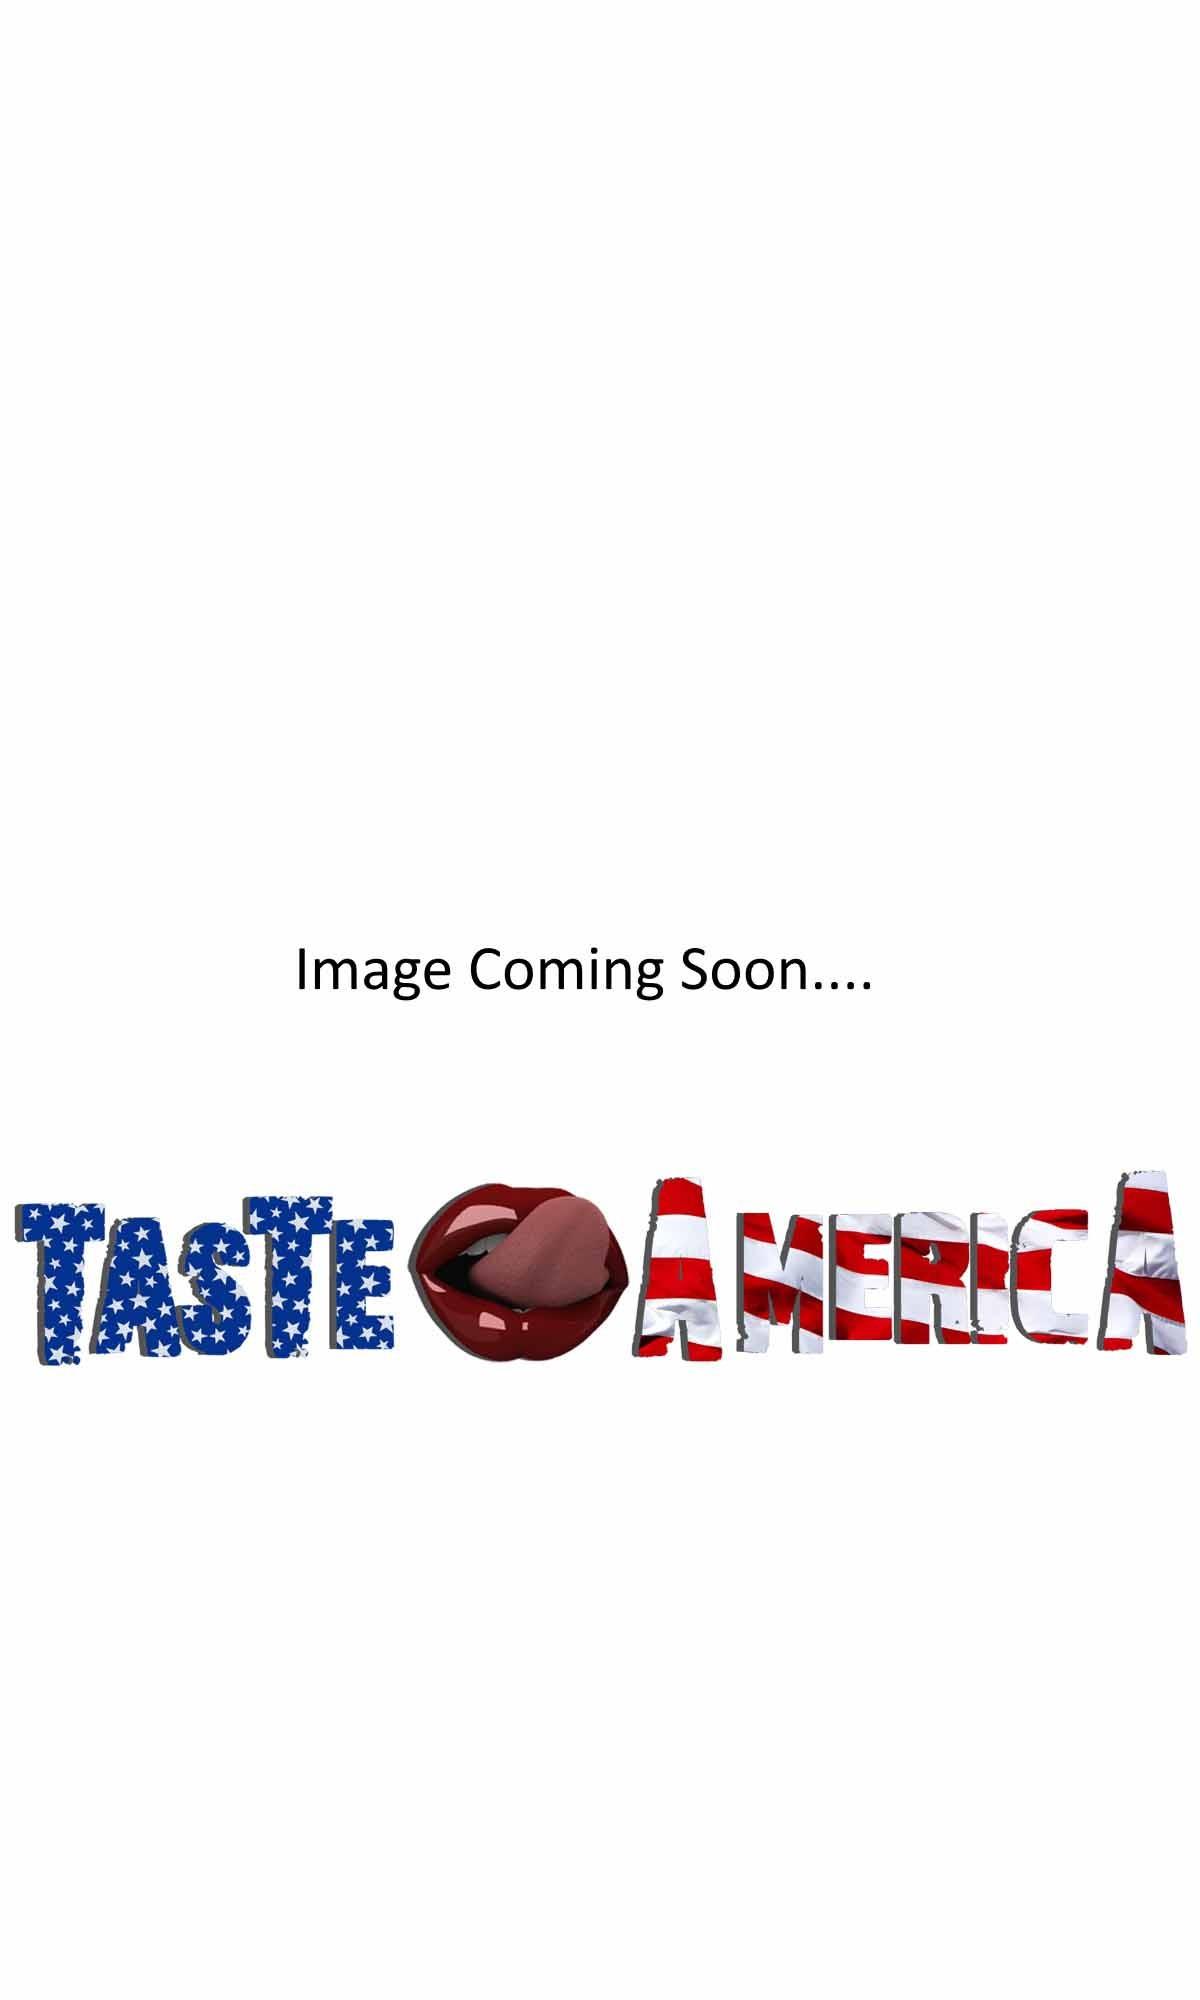 Buy Pillsbury Funfetti Premium Cake Mix With Candy Bits At Taste America